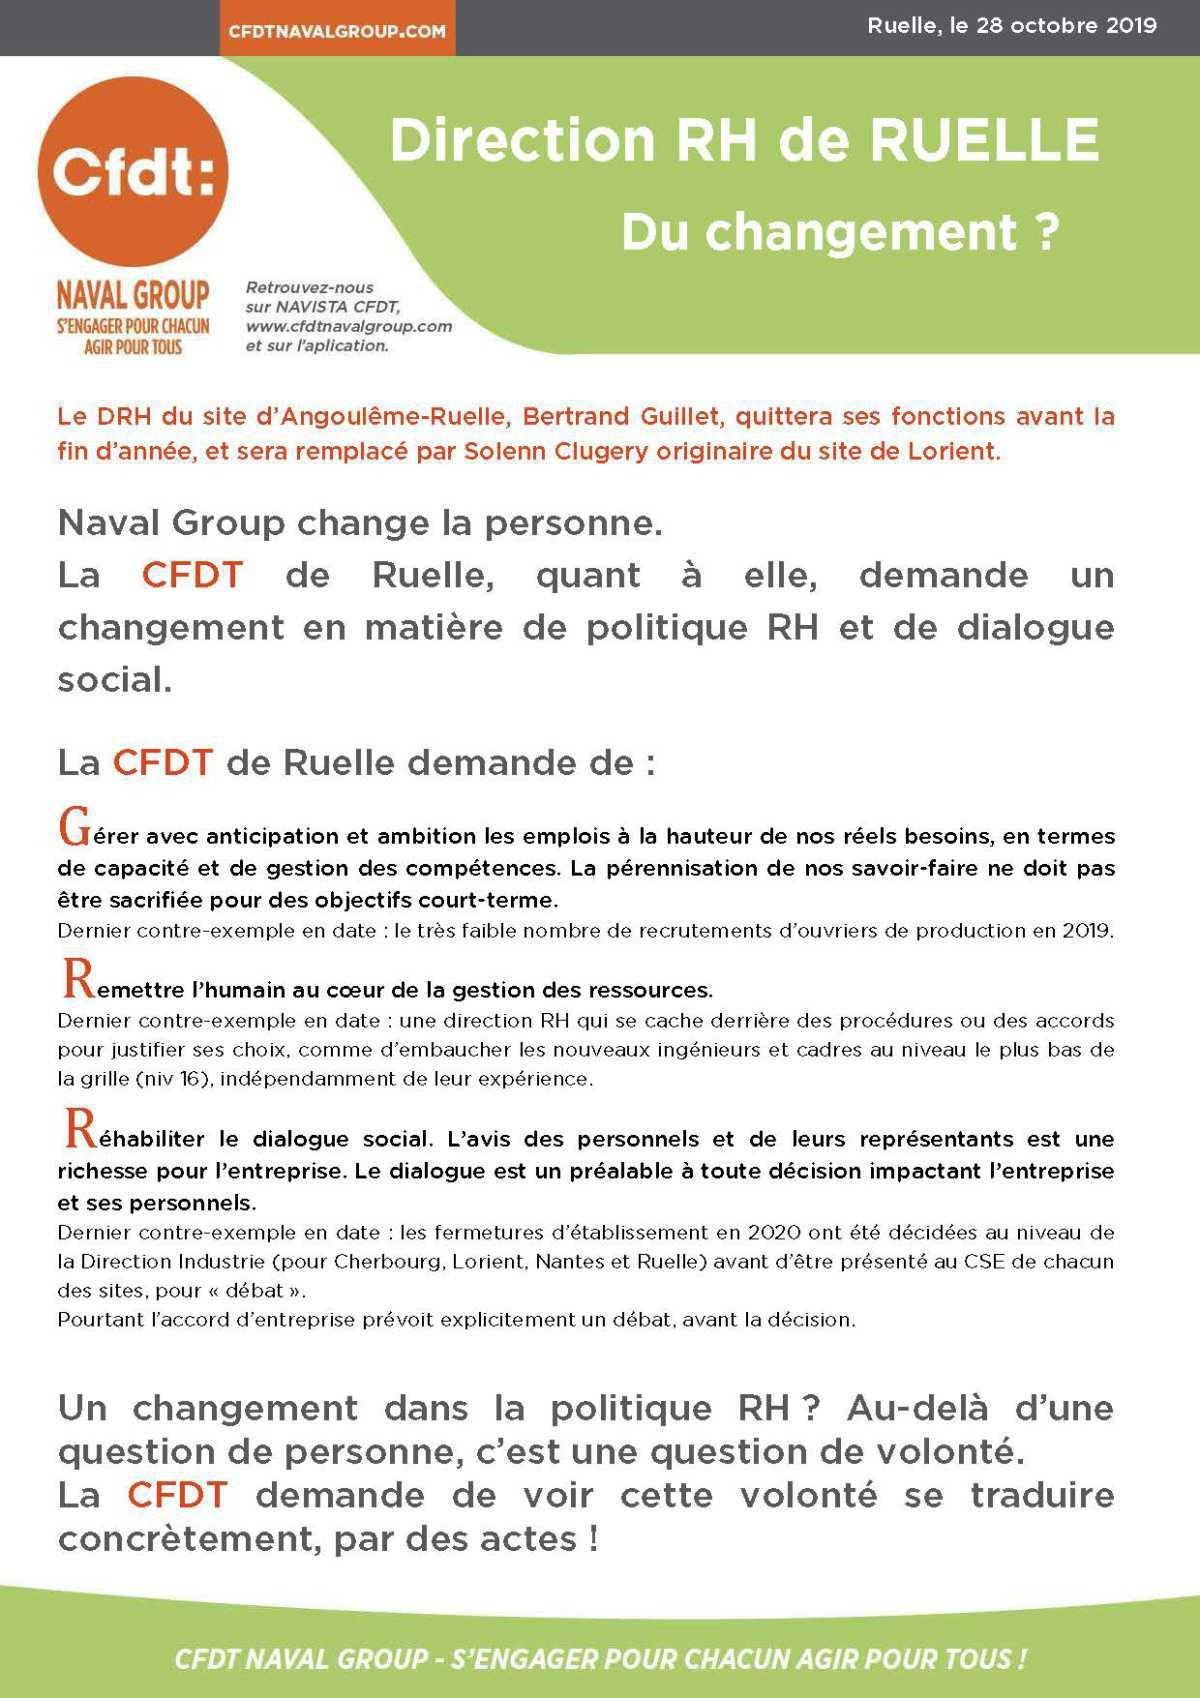 Direction RH de Ruelle